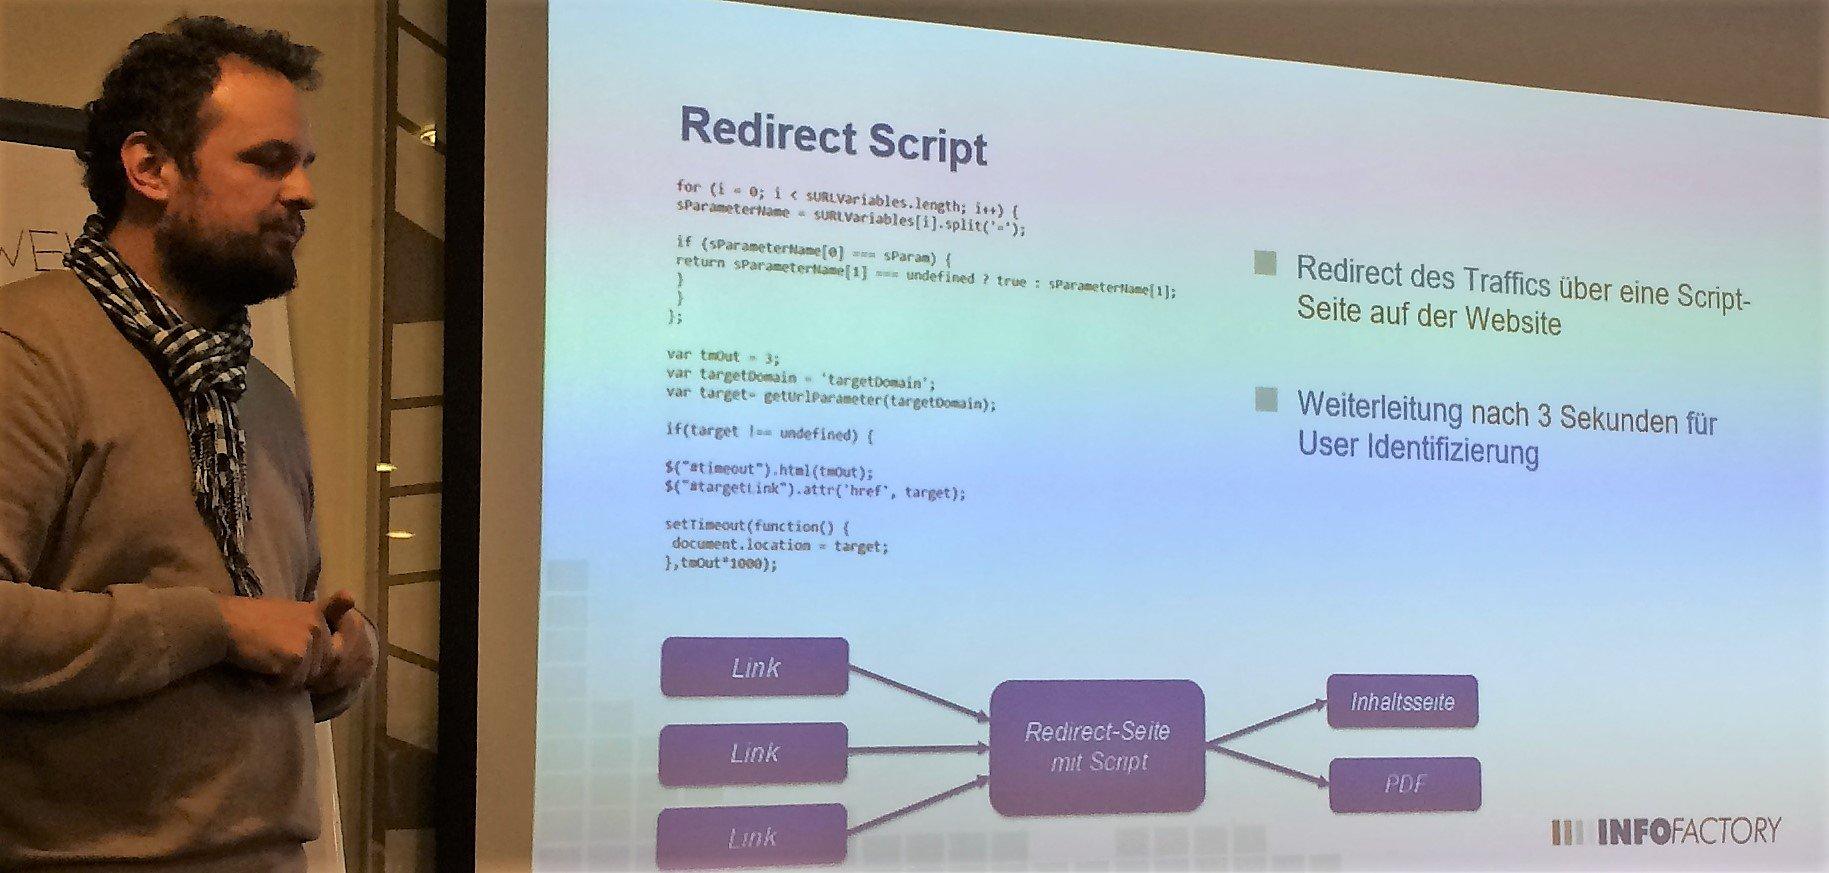 Redirect Script